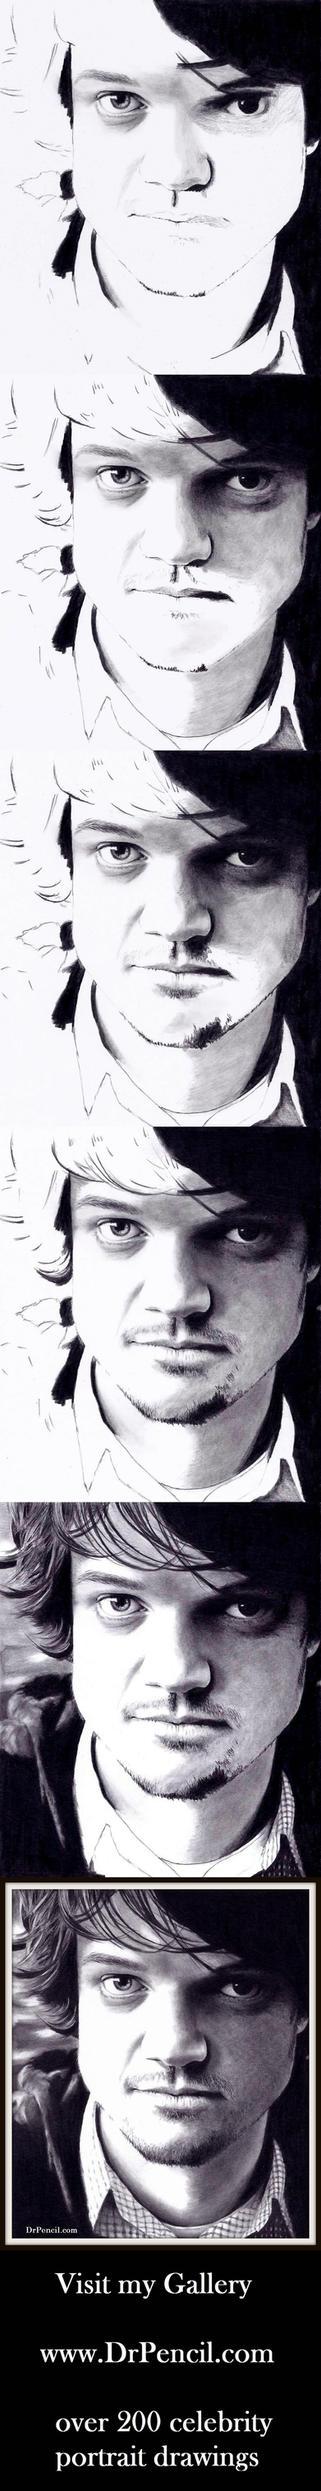 Matt Jones - Badger on BREAKING BAD - WIP strip by Rick-Kills-Pencils